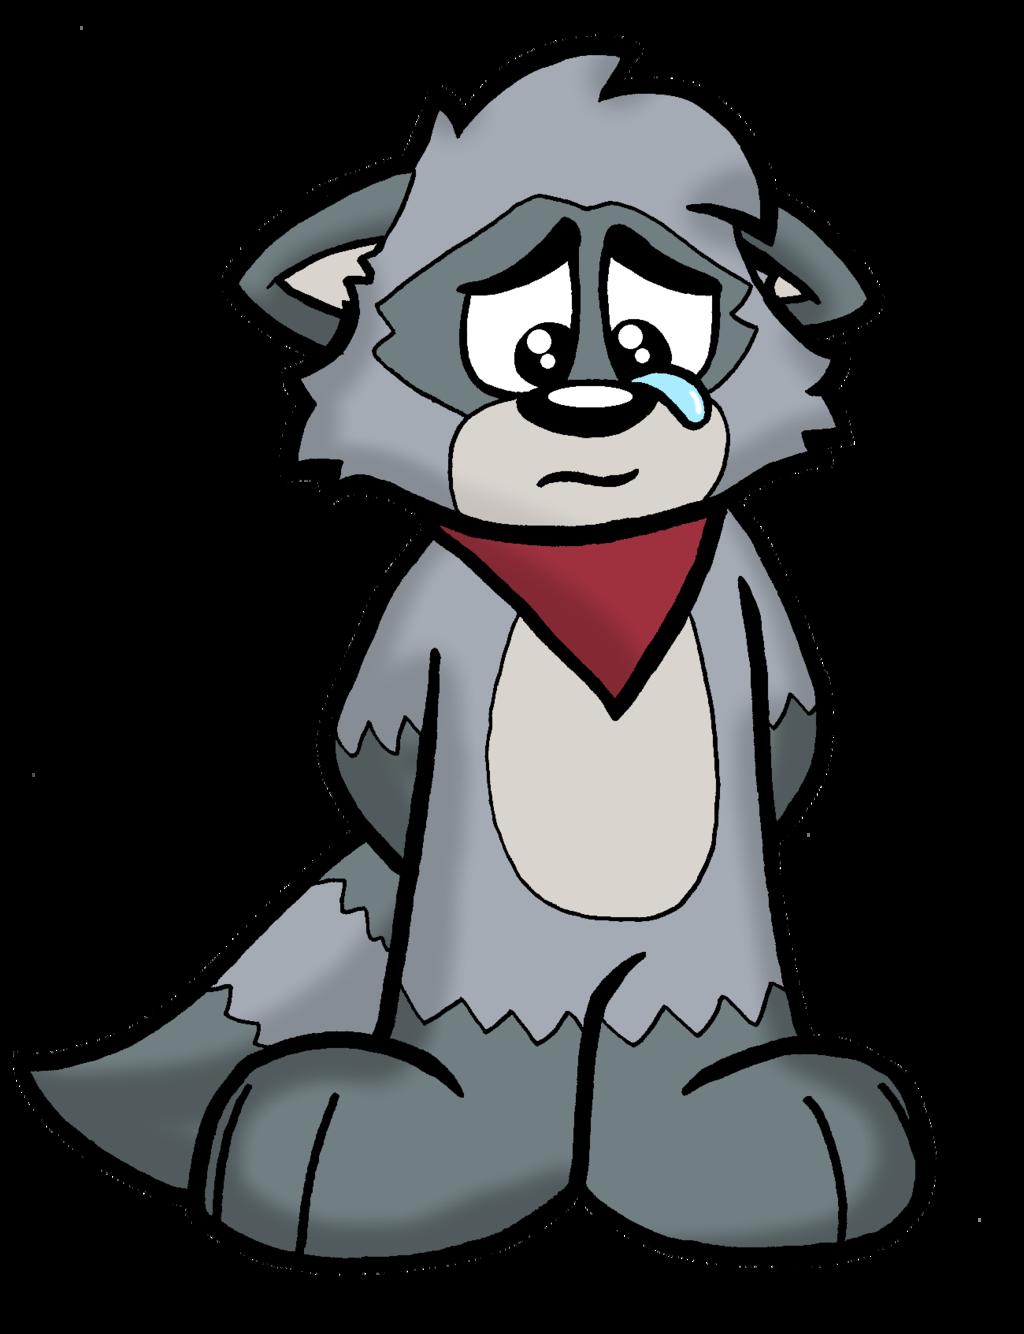 Sad cartoons images free. Shy clipart gloomy